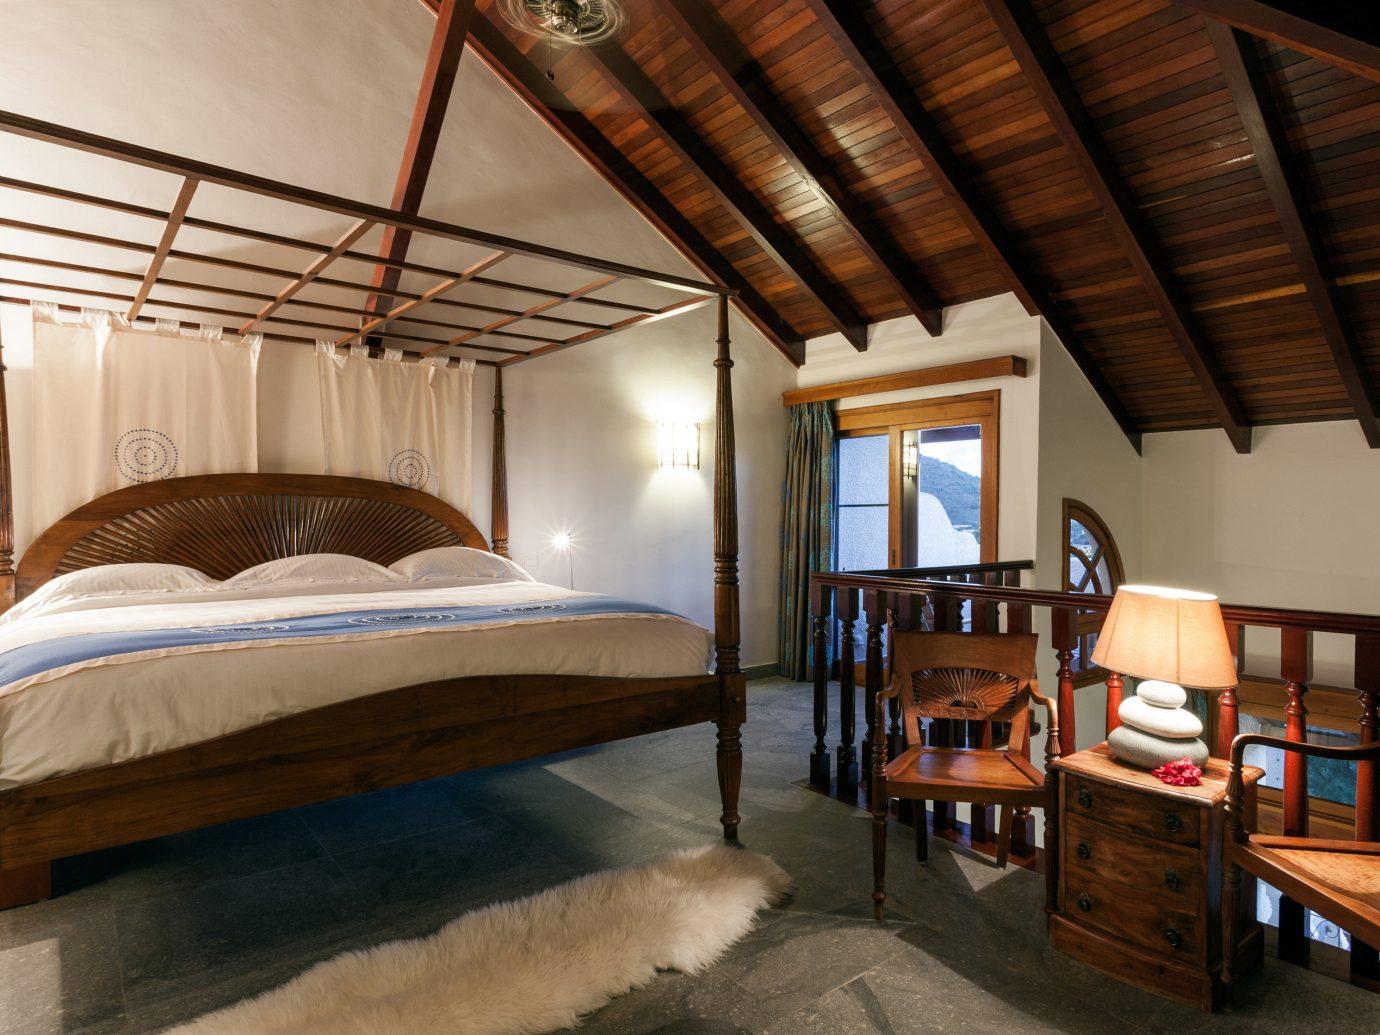 Hotels indoor floor wall room bed chair ceiling Bedroom wooden real estate furniture interior design bed frame estate wood